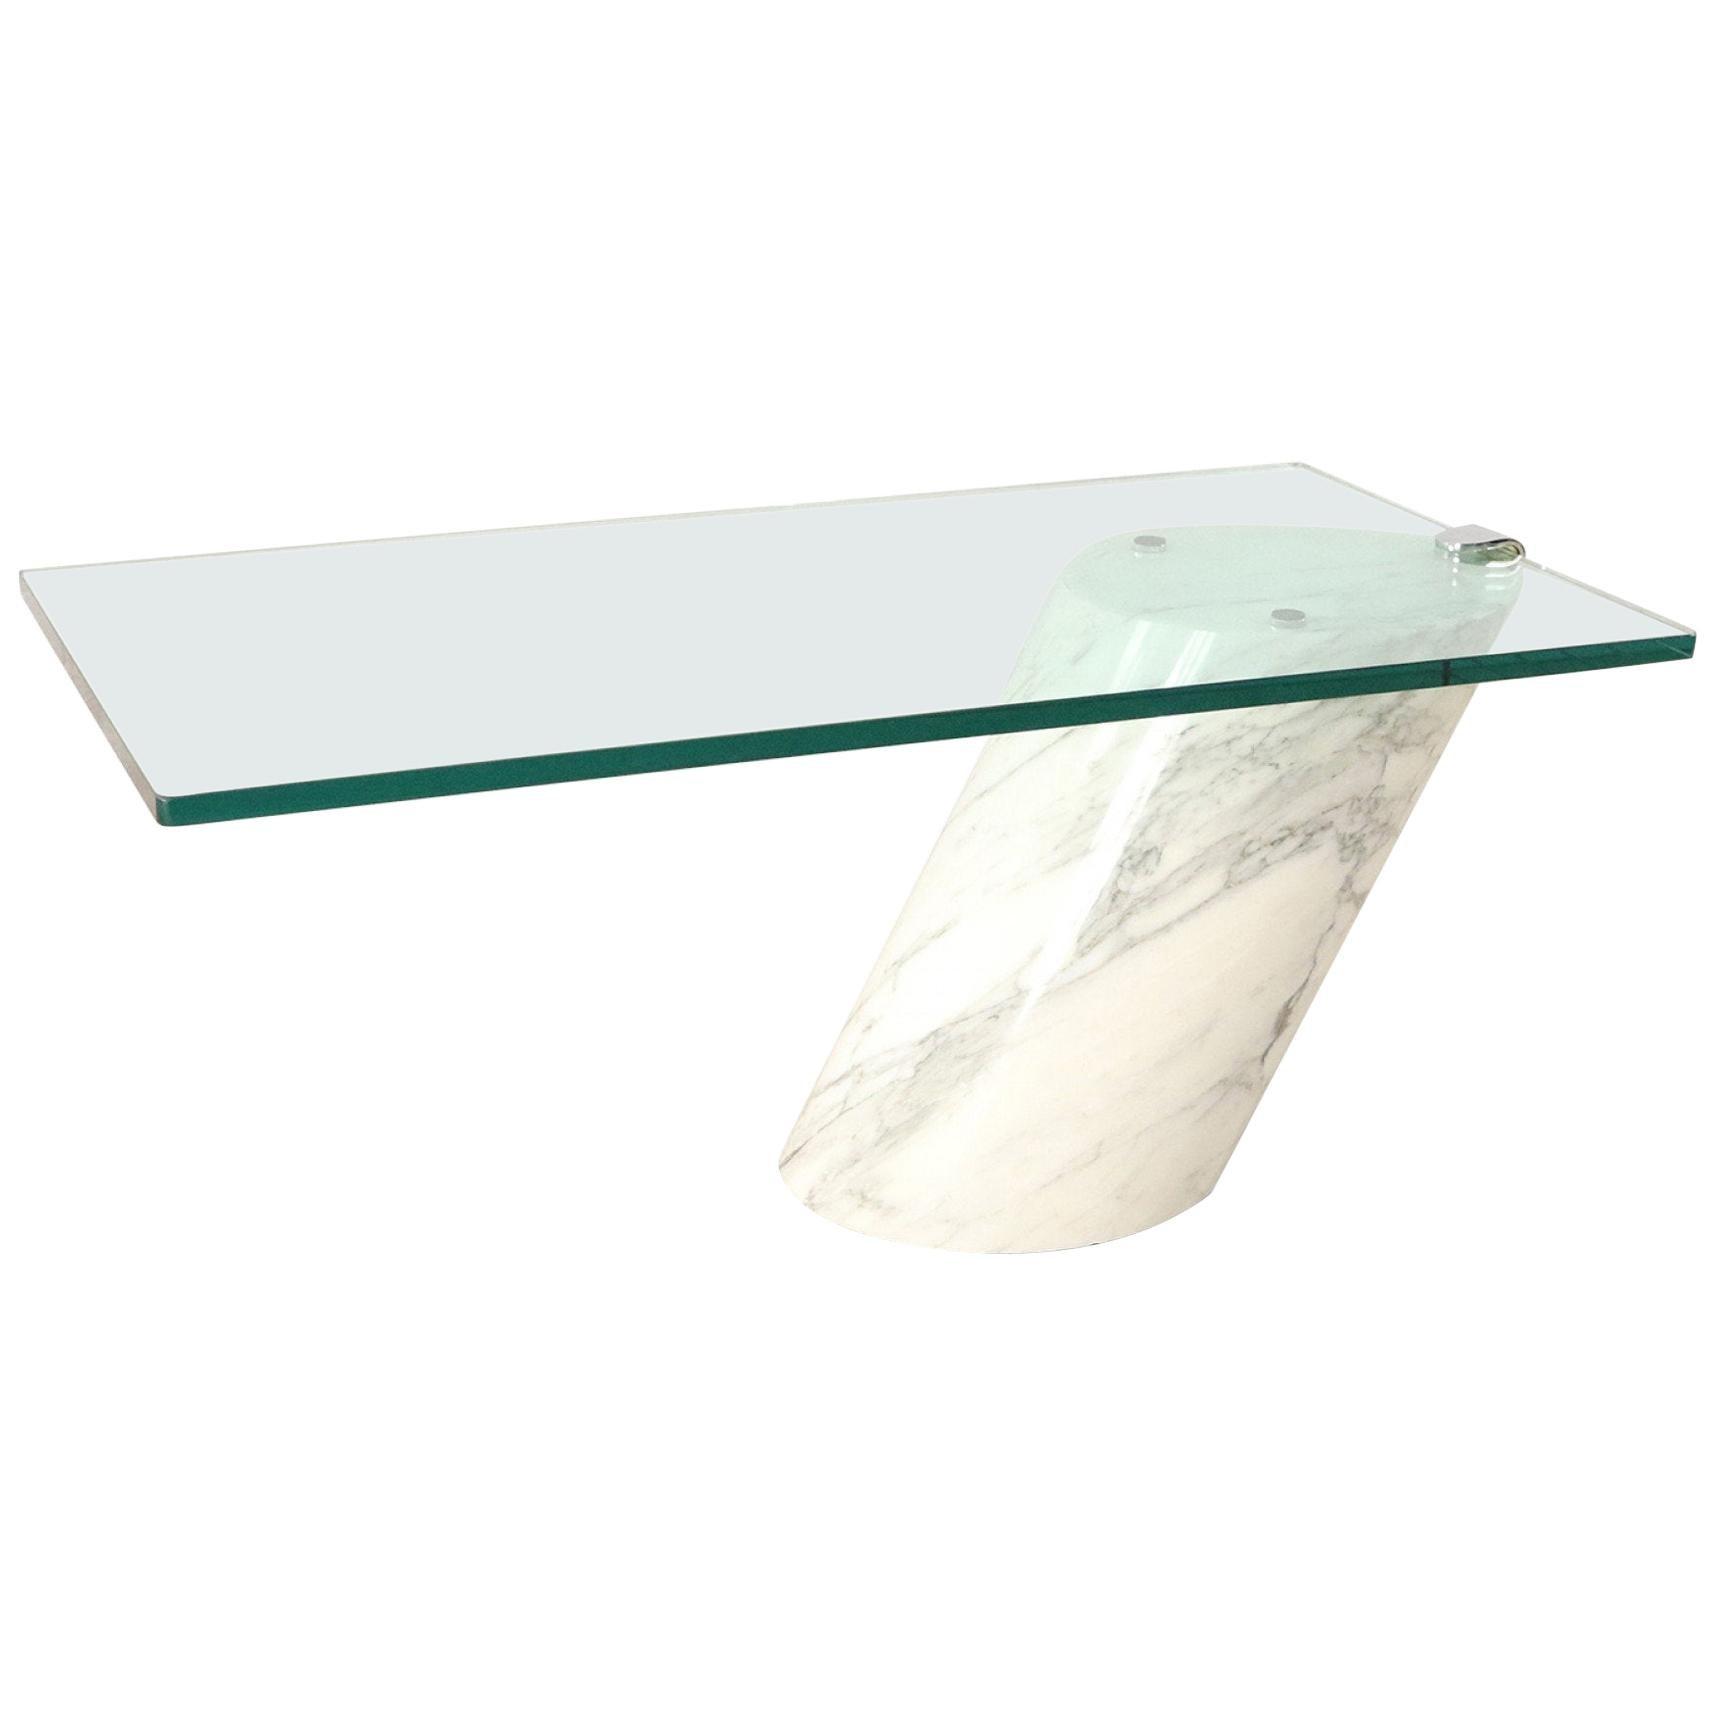 Ronald Schmitt for Brueton White Carrara Marble and Glass Coffee Table